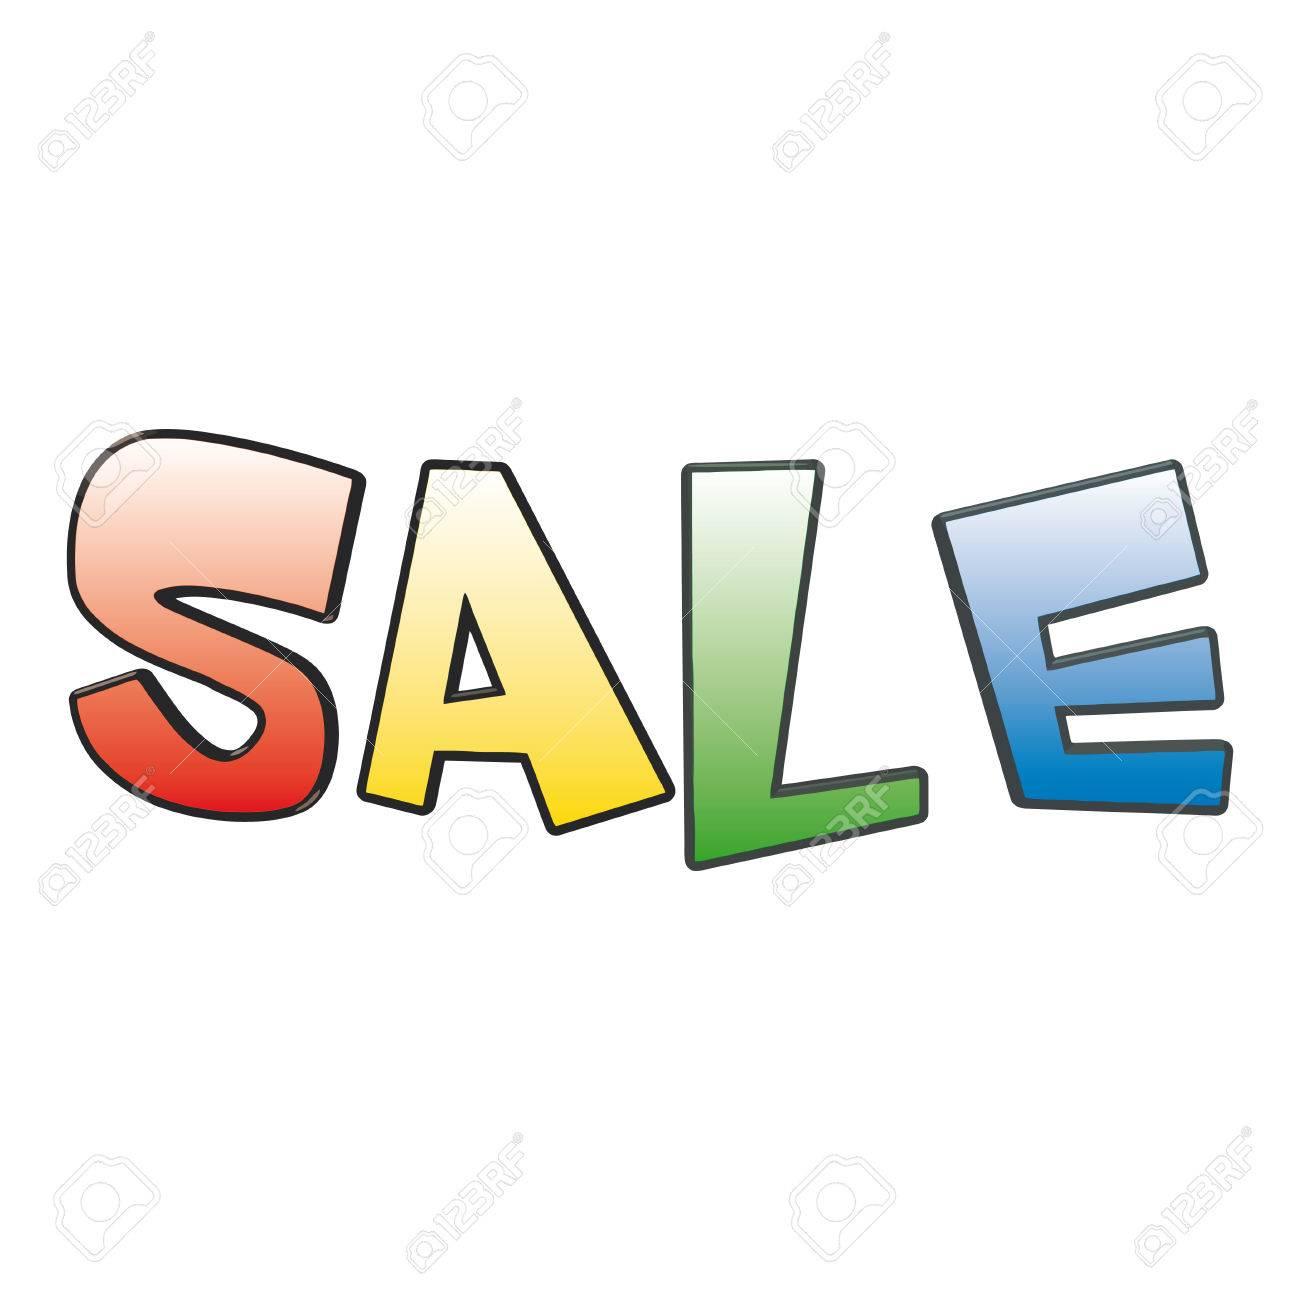 Sale. Stock Vector - 6031668